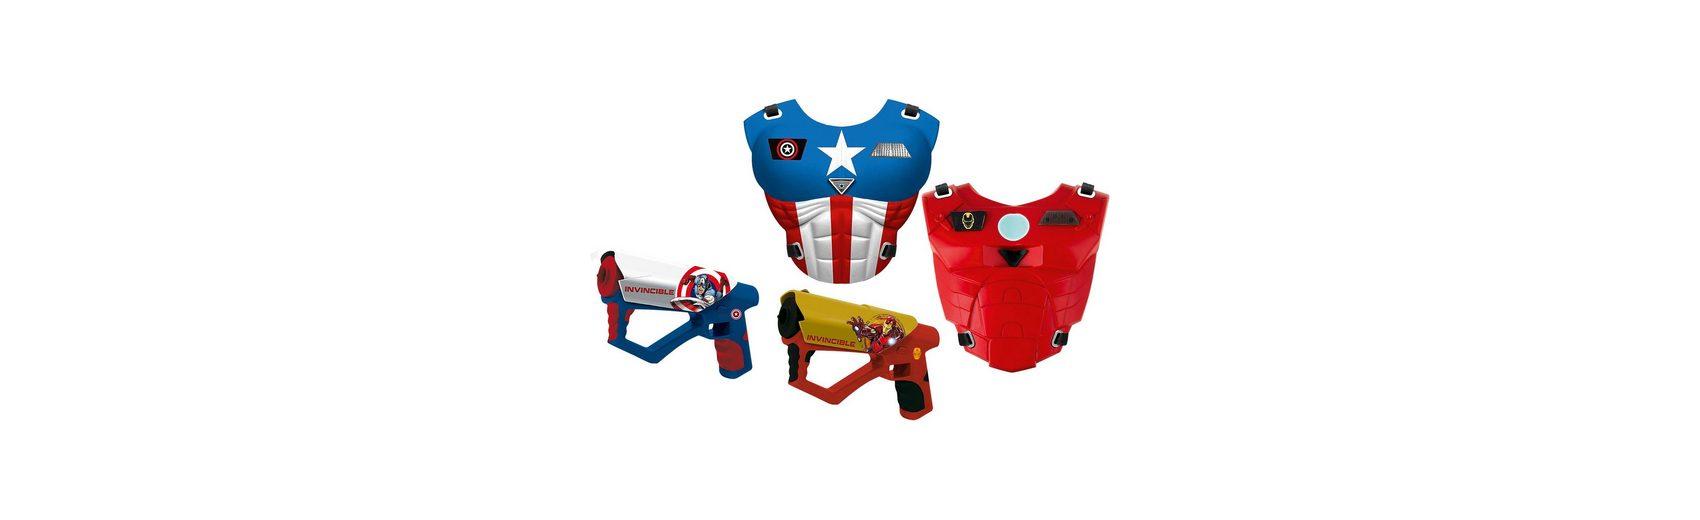 IMC Toys Avengers Mega Laser Set - Iron Man und Captain America